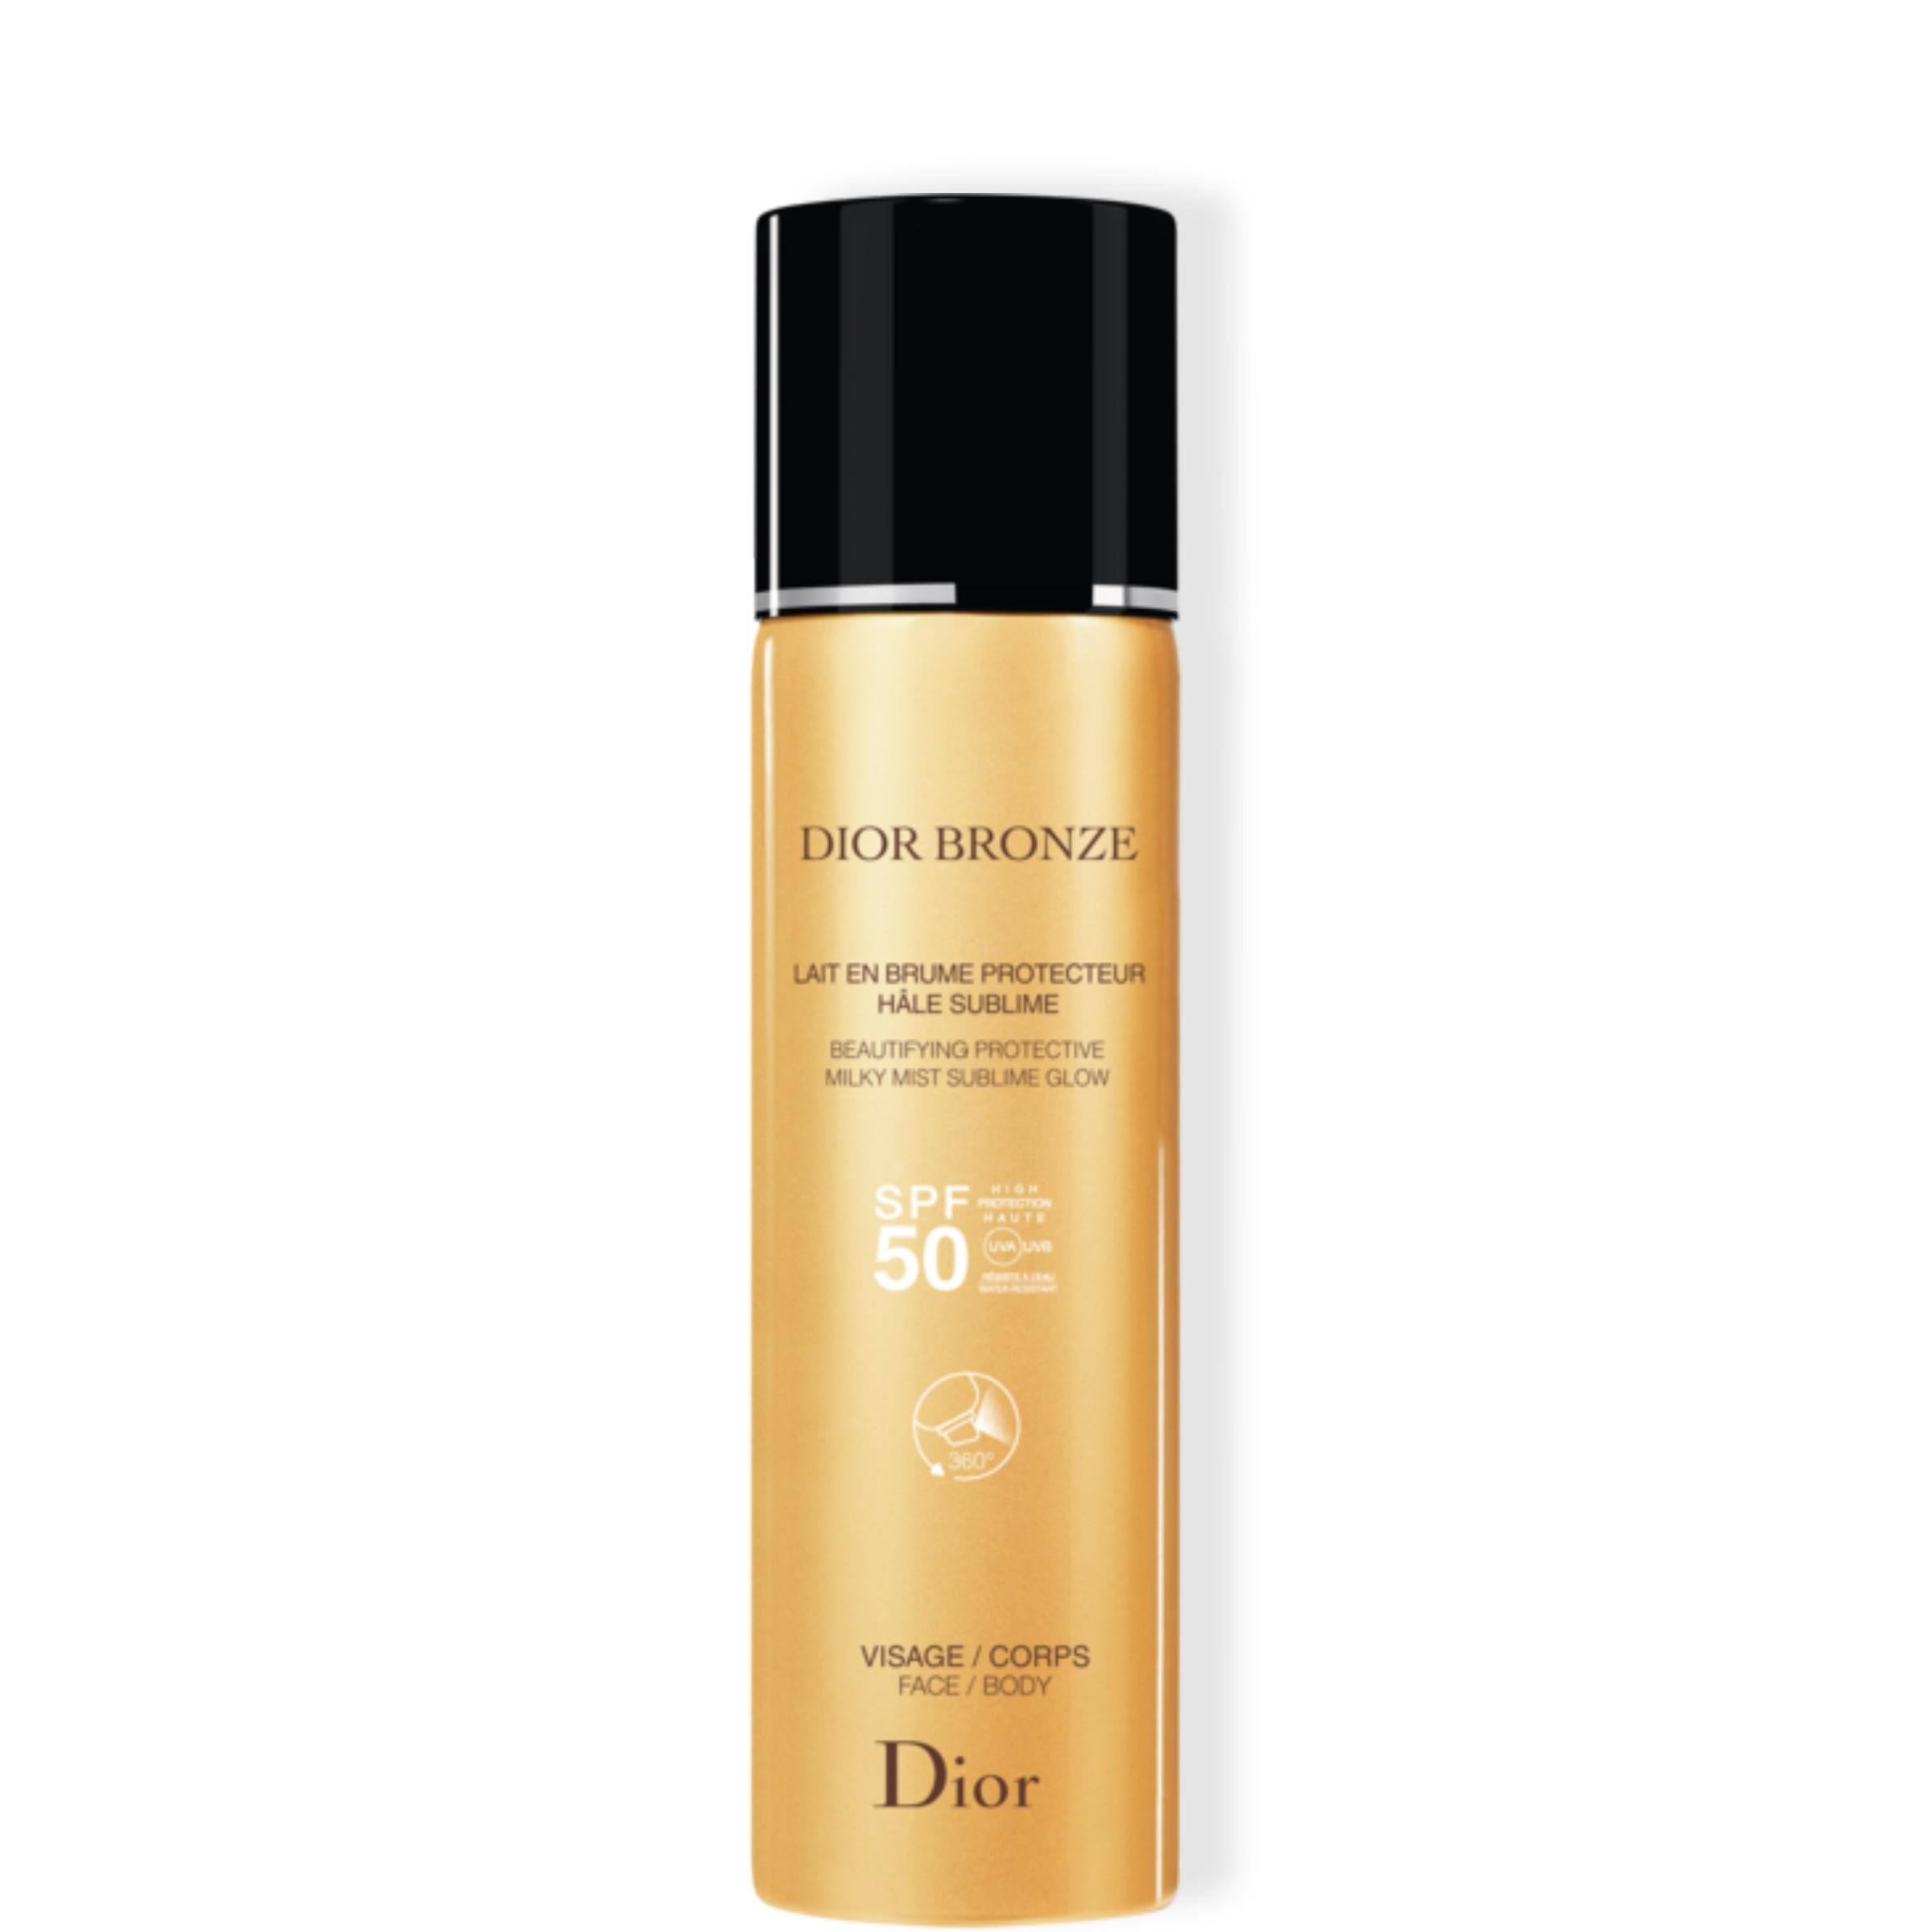 Diorbronze Protect Milky Mist SPF50